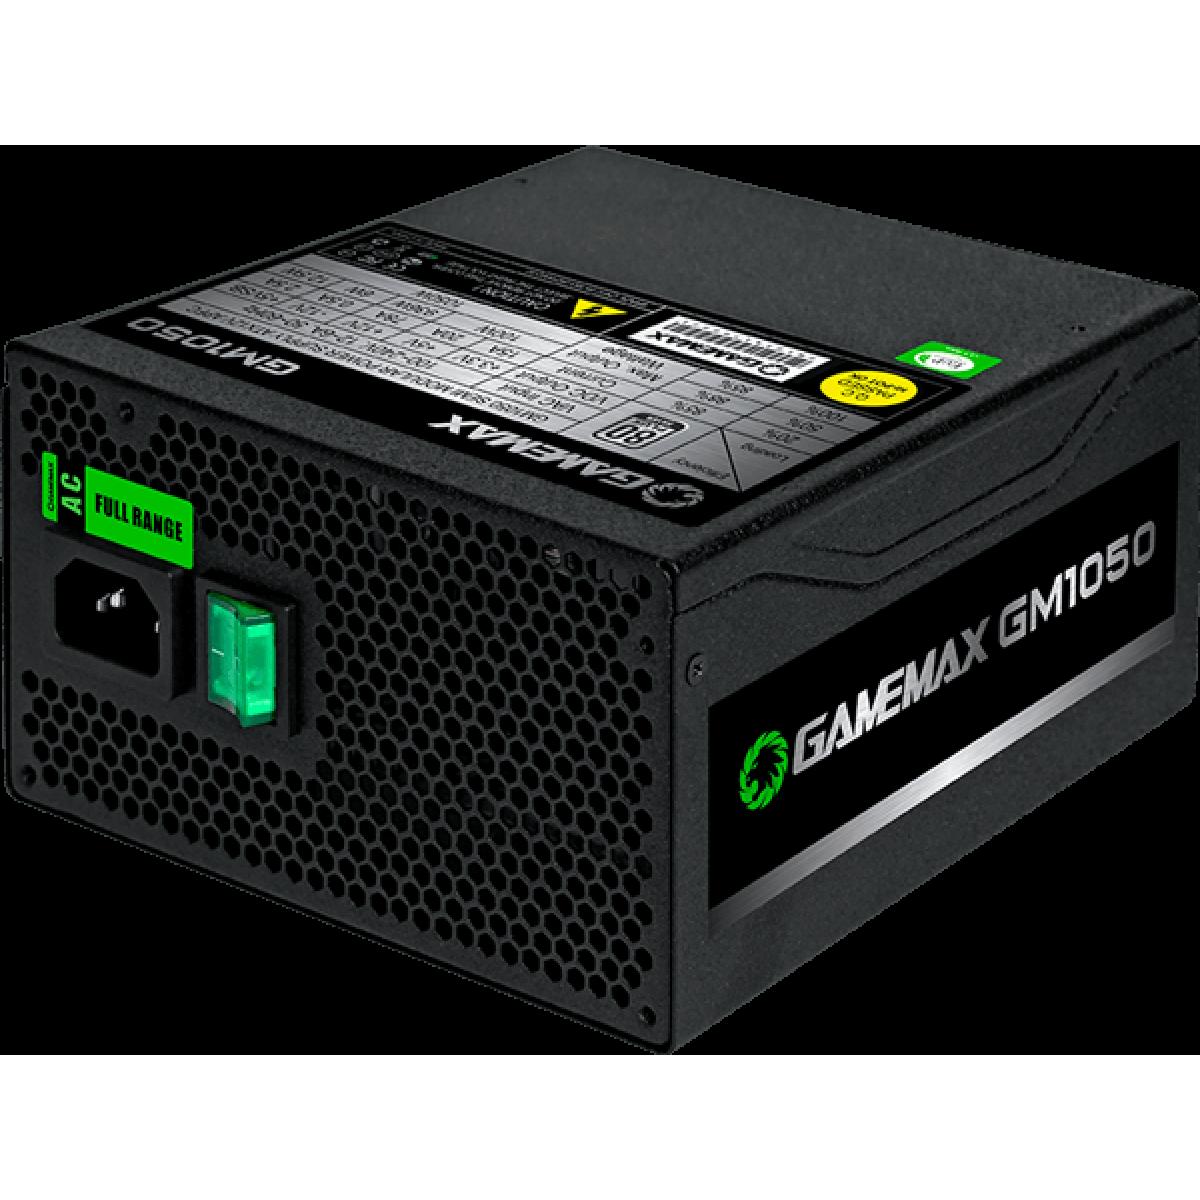 Fonte Gamemax GM1050 1050W, 80 Plus Silver, PFC Ativo